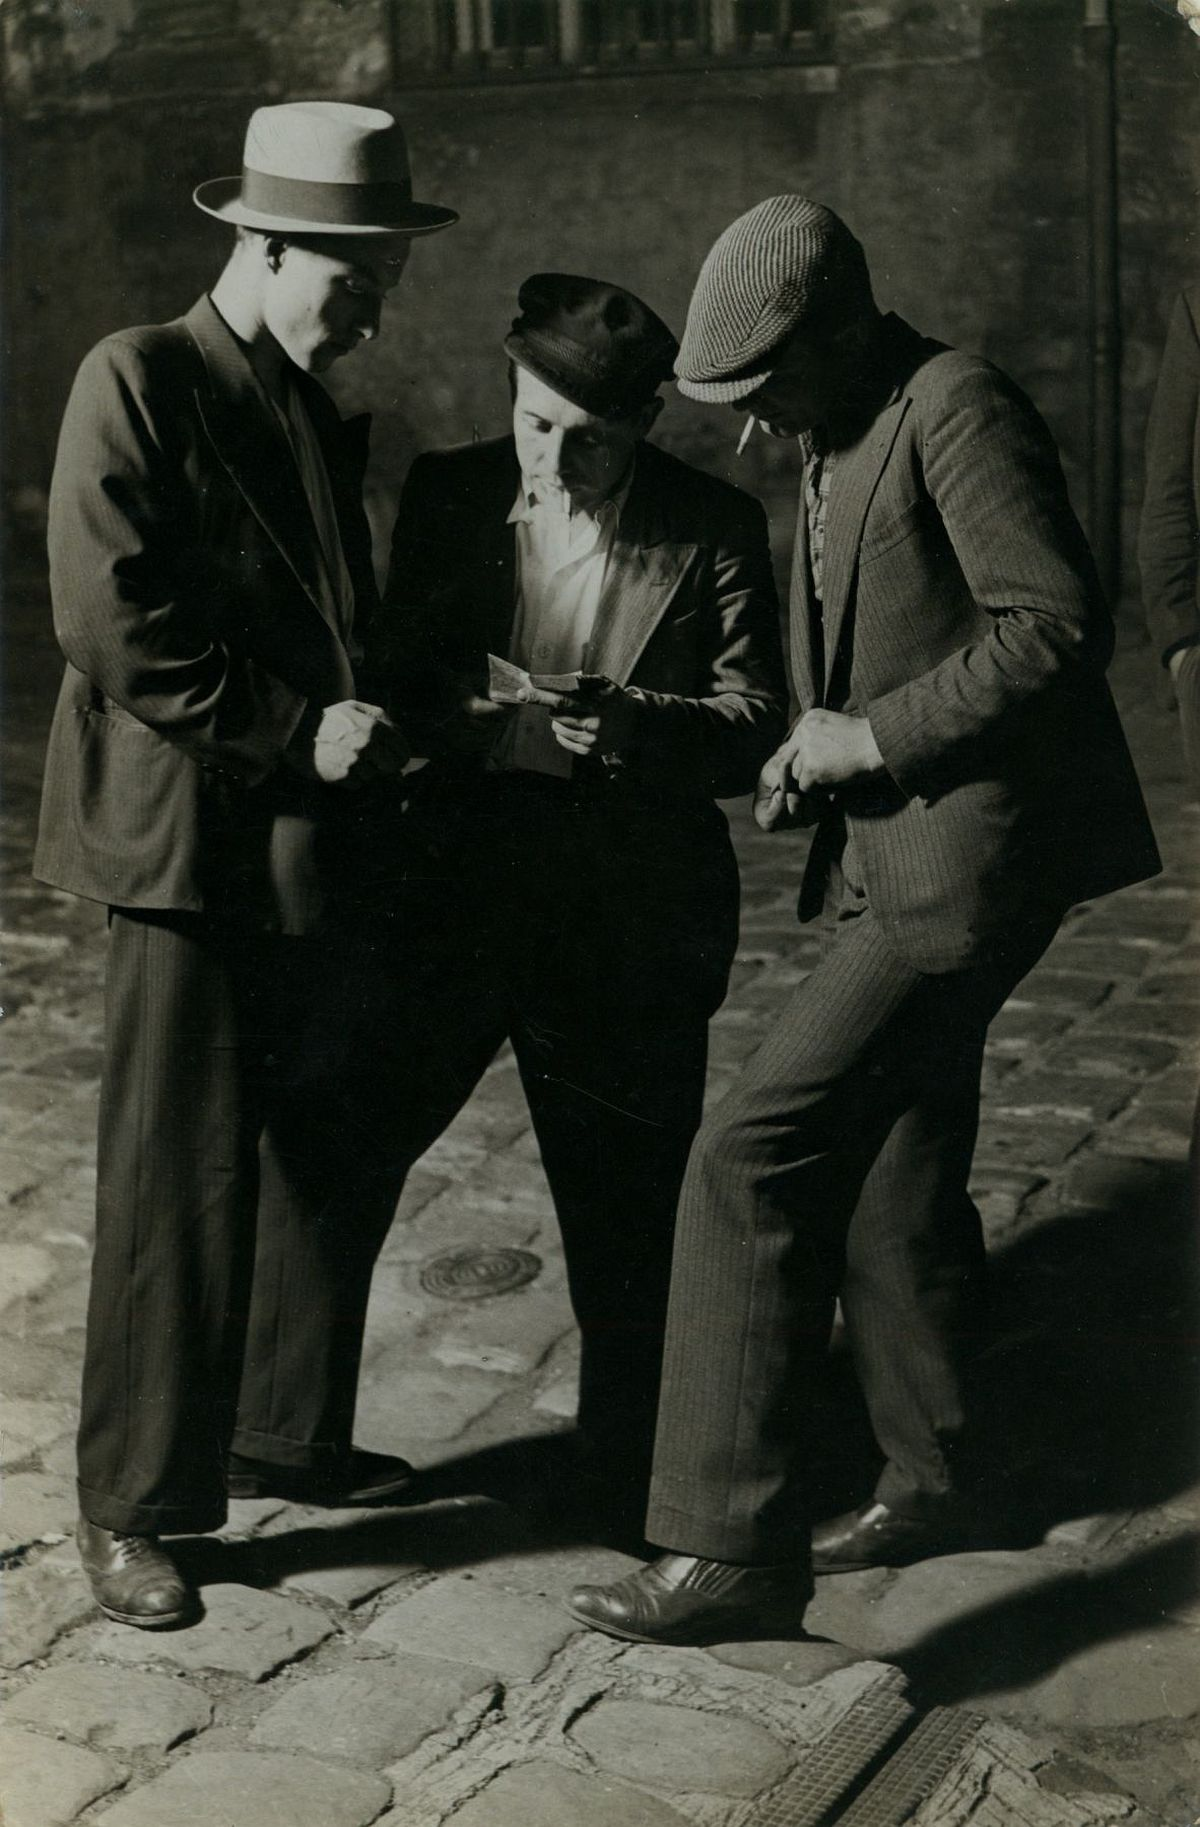 Brassaï, Gens du Milieu, c. 1932